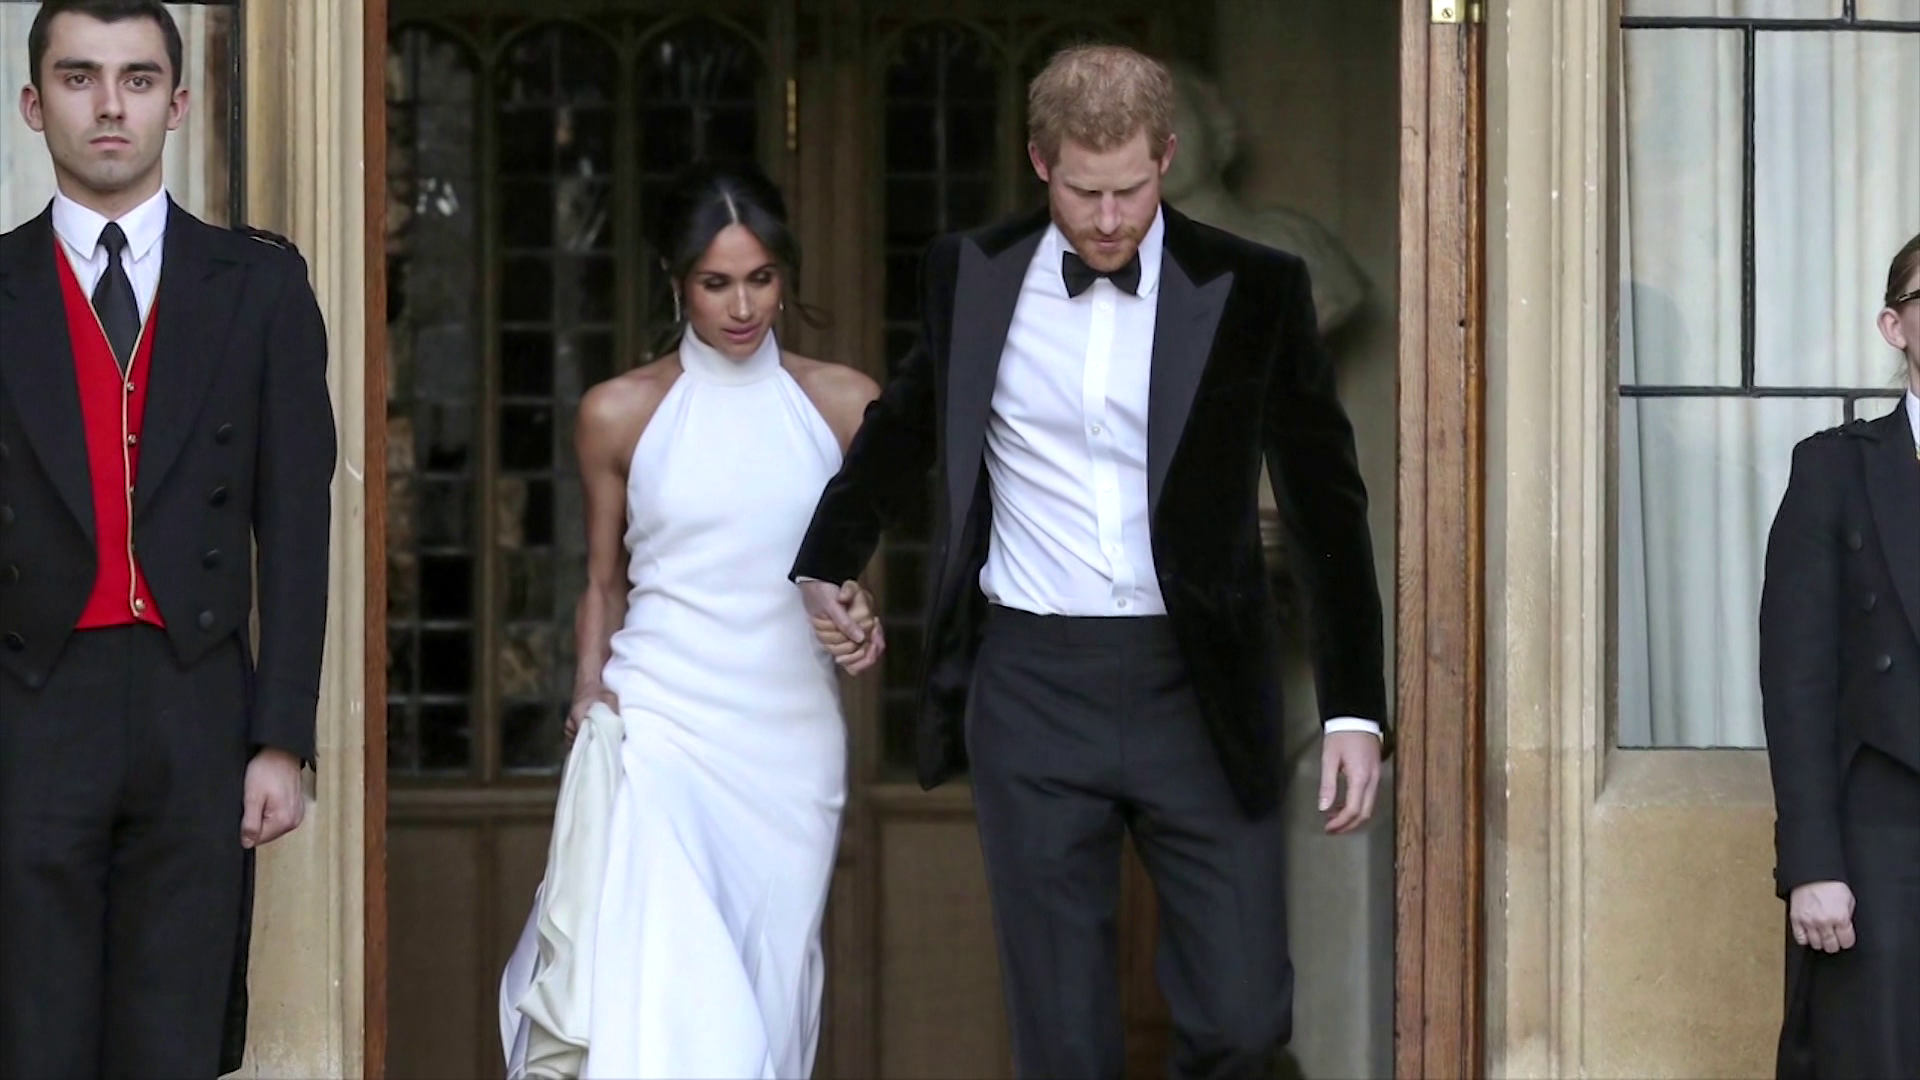 Megxit, la fine di Harry e Meghan, la tenacia di Elisabetta II: è o non è un happy ending?